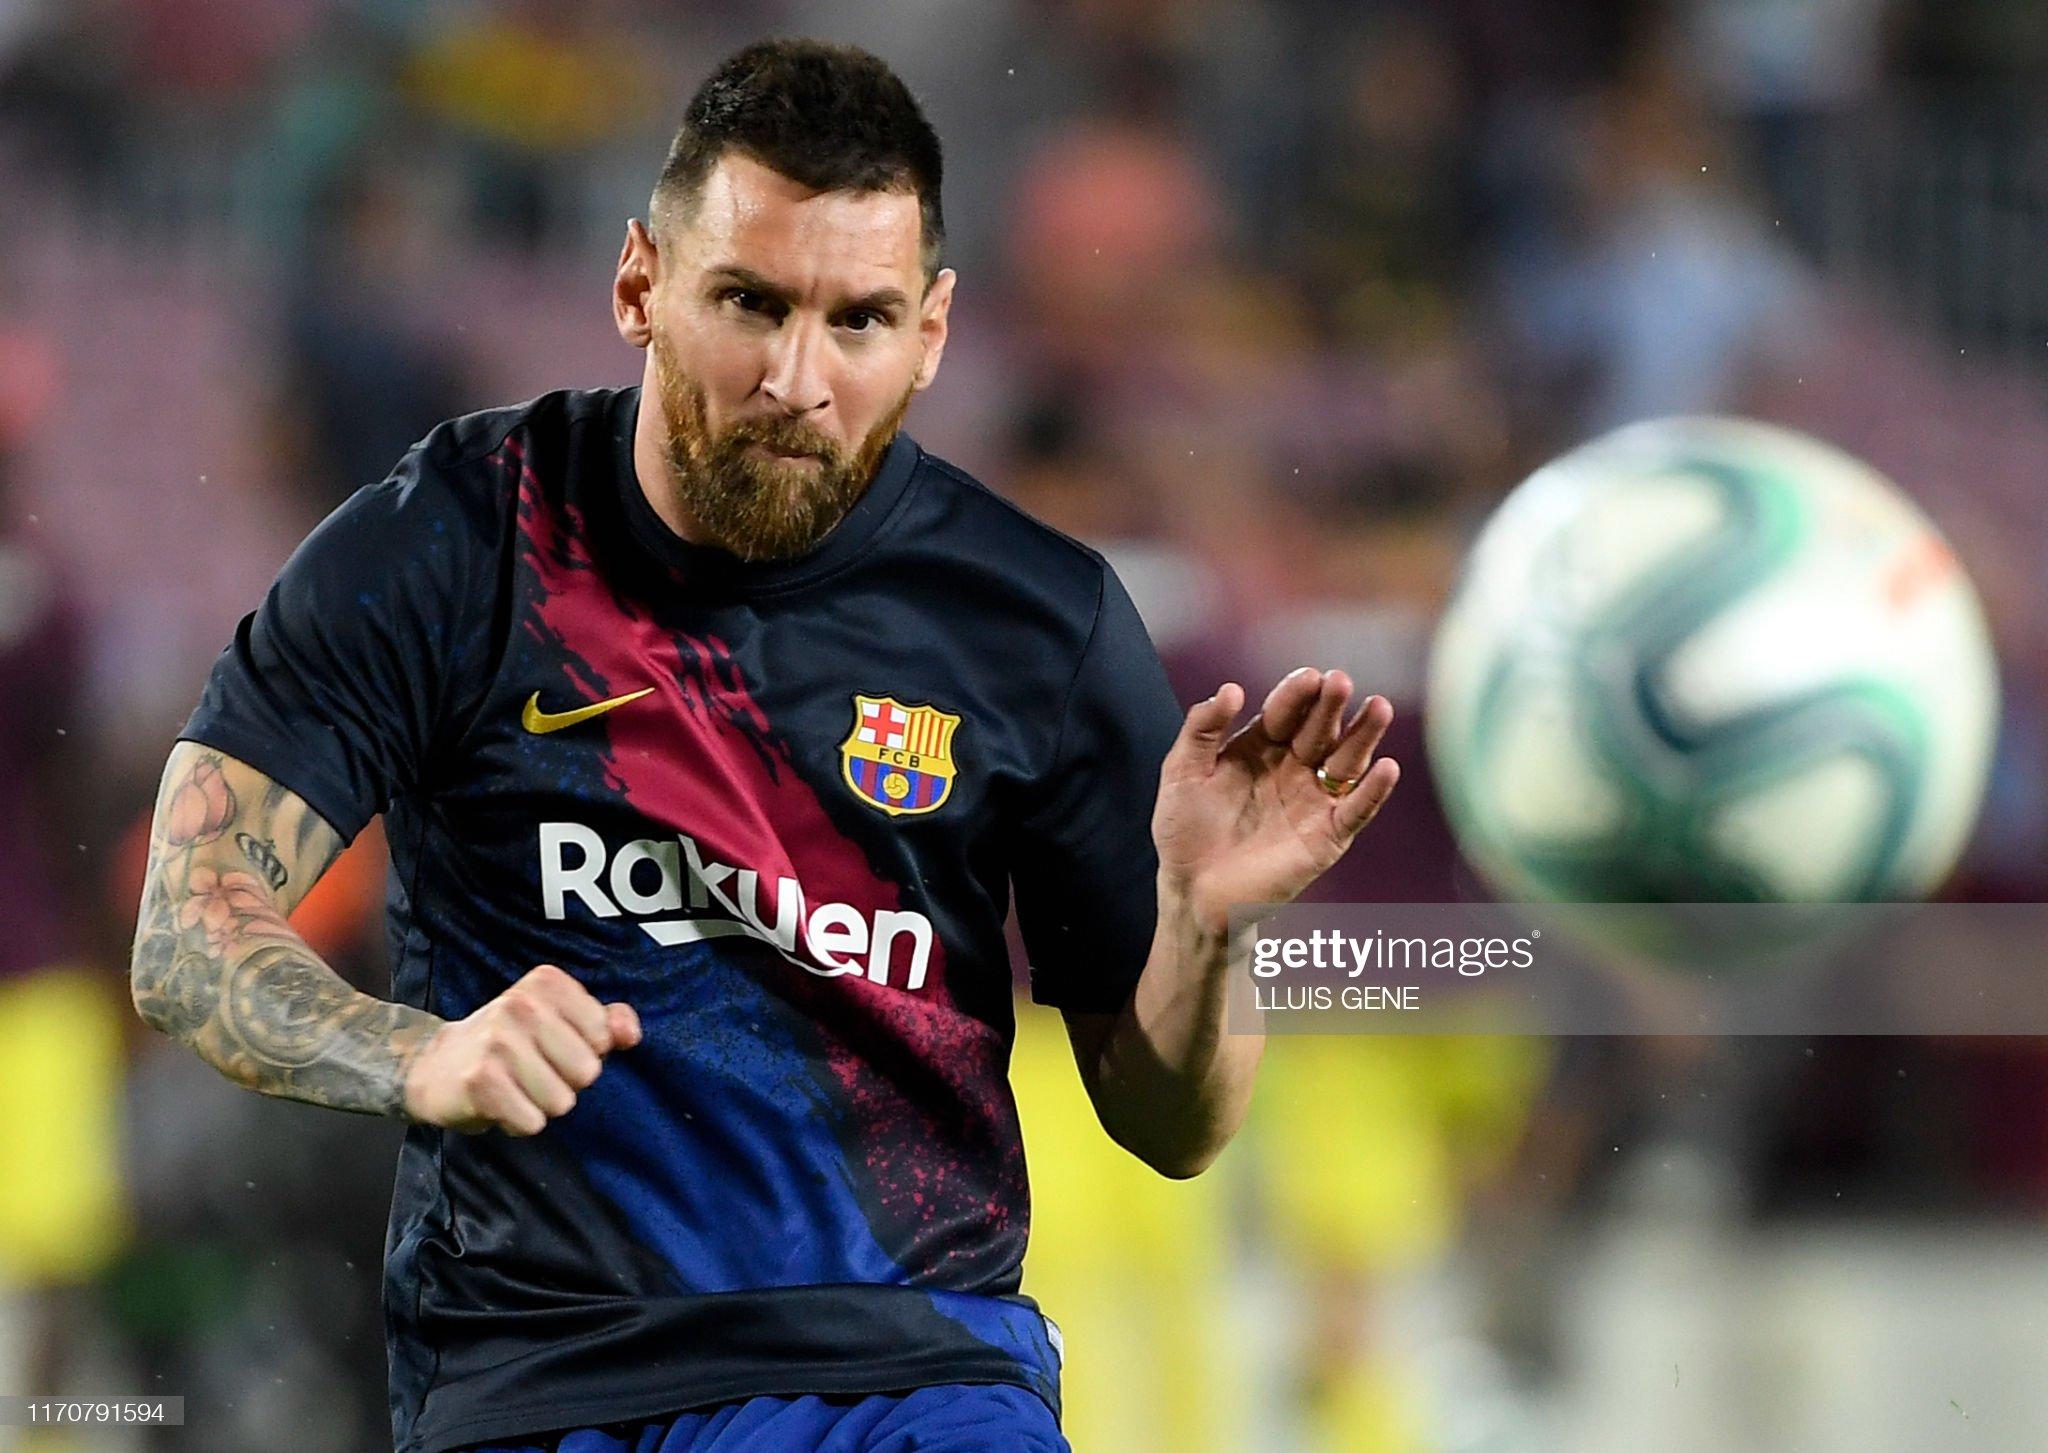 صور مباراة : برشلونة - فياريال 2-1 ( 24-09-2019 )  Barcelonas-argentine-forward-lionel-messi-eyes-the-ball-as-he-warms-picture-id1170791594?s=2048x2048